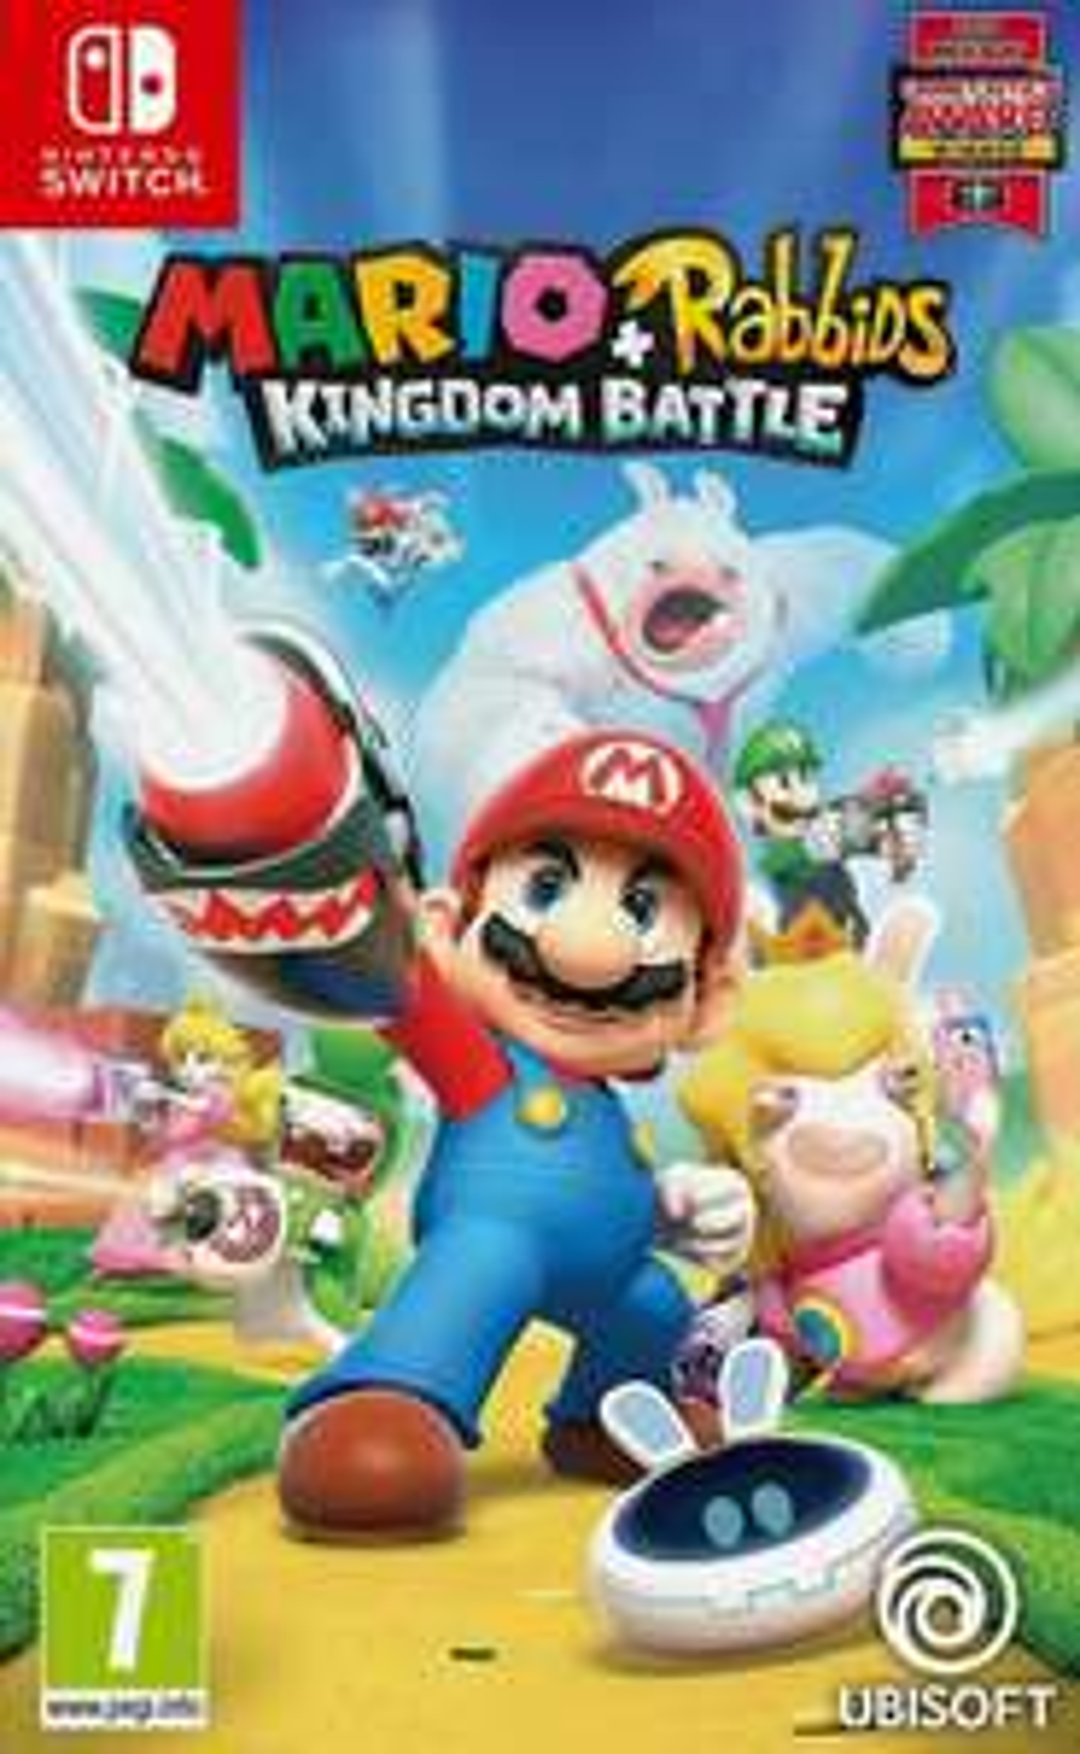 Mario + Rabbids: Kingdom Battle Nintendo Switch Game £16.76 using code @ TheGameCollectionoutlet / eBay